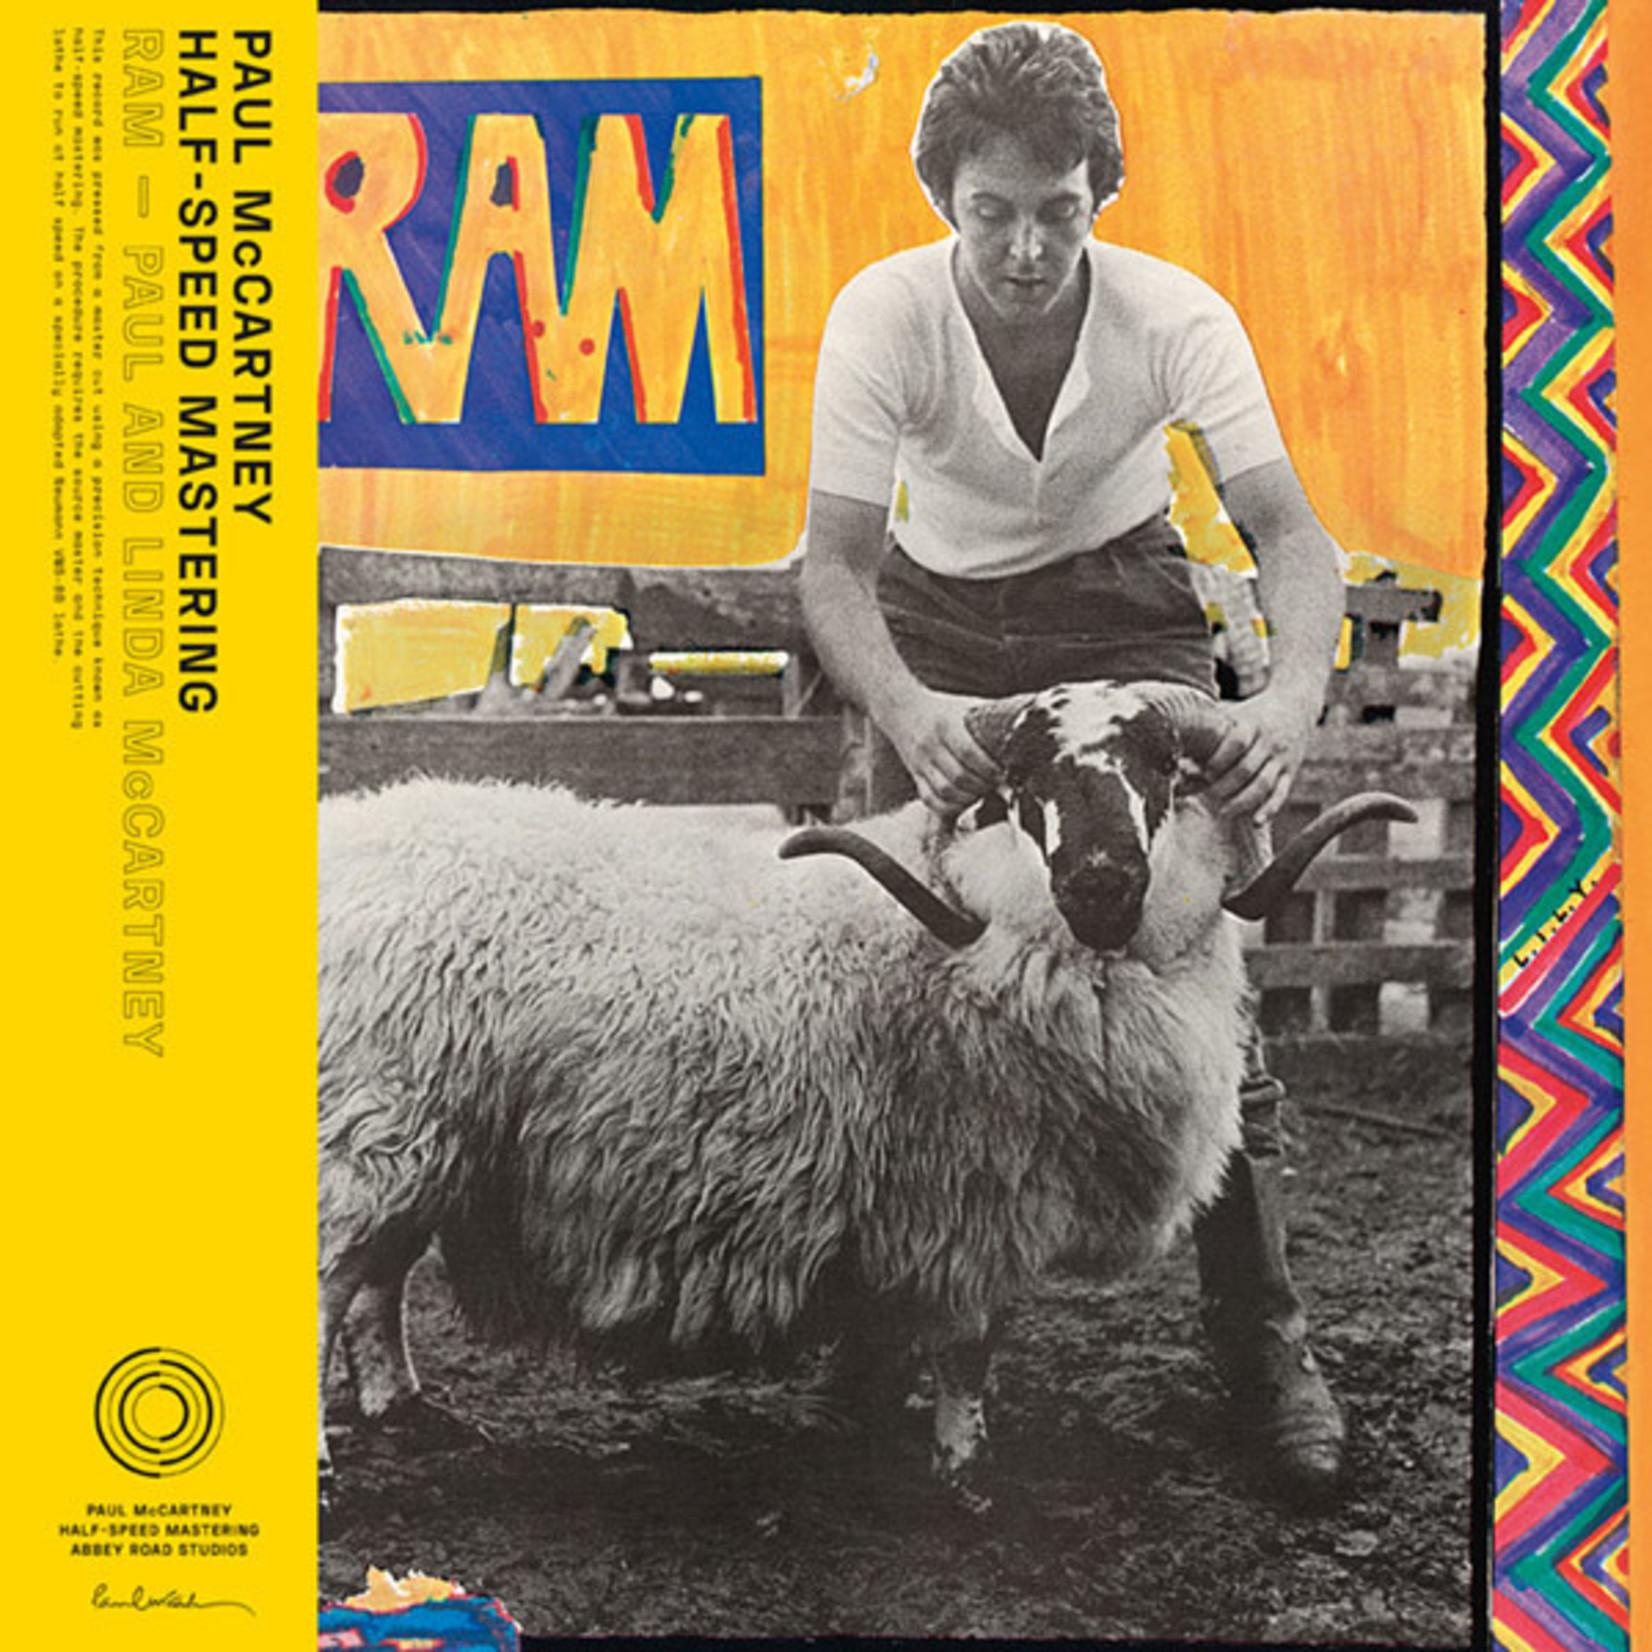 [New] McCartney, Paul & Linda (Beatles): Ram (50th Anniversary Ed., Abbey Road half-speed remaster)